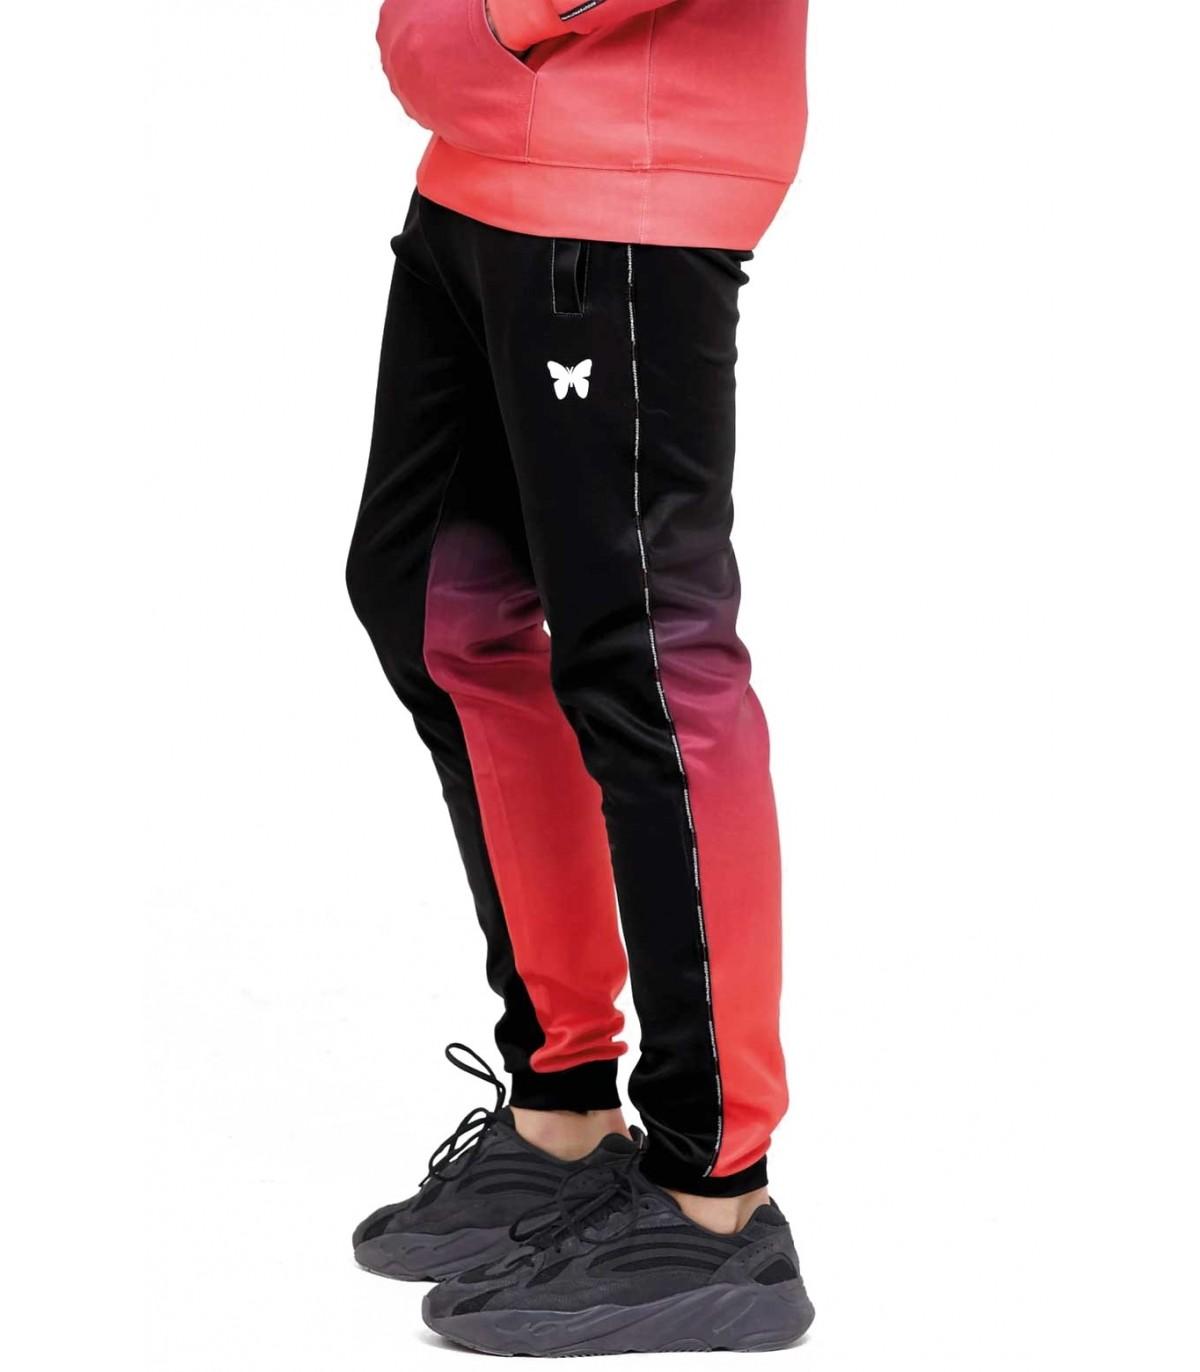 Good For Nothing Pantalon Para Hombre Negro Rojo Degradado